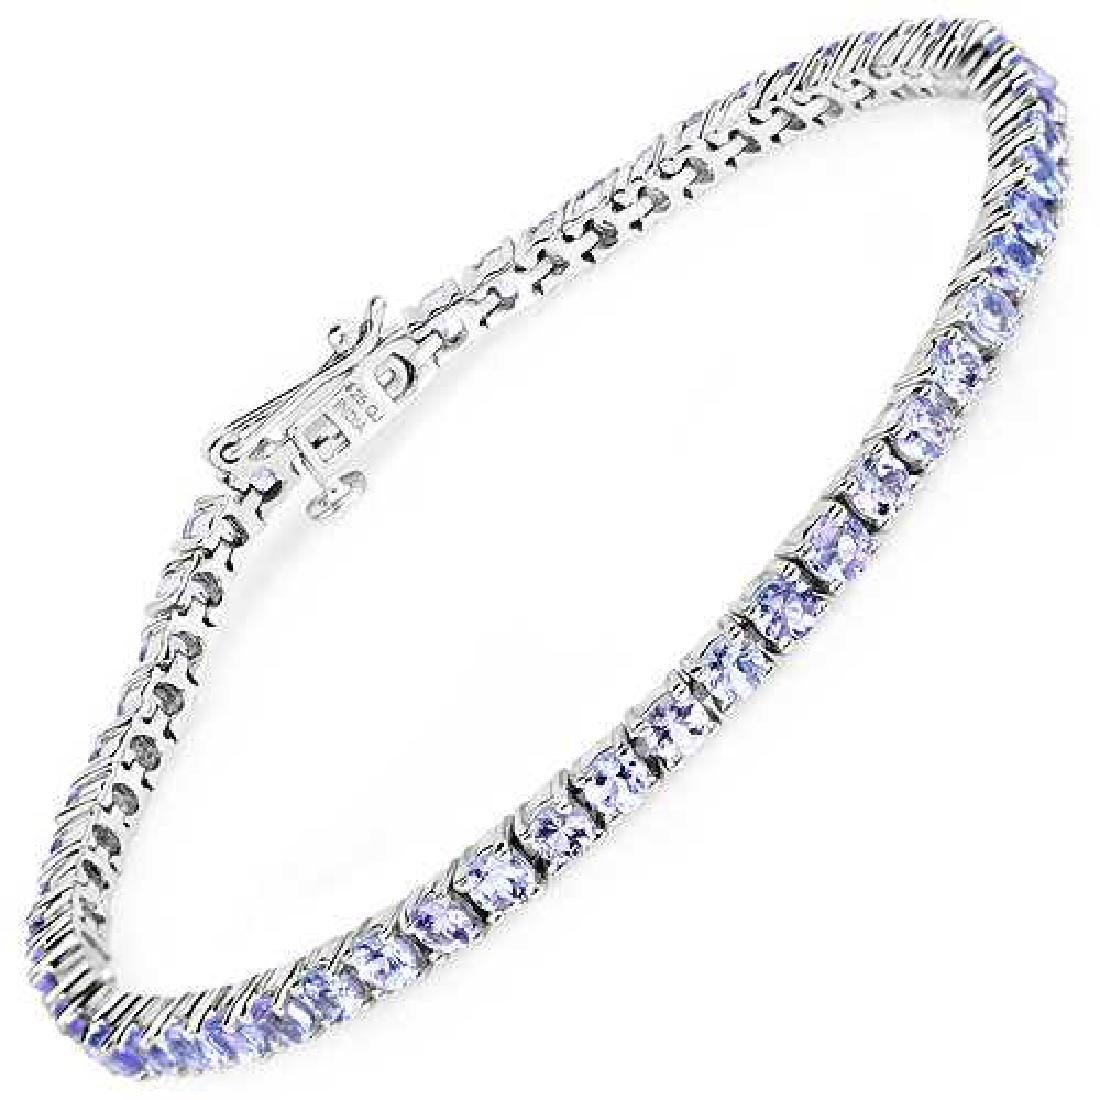 5.30 CTW Genuine Tanzanite 14K White Gold Bracelet